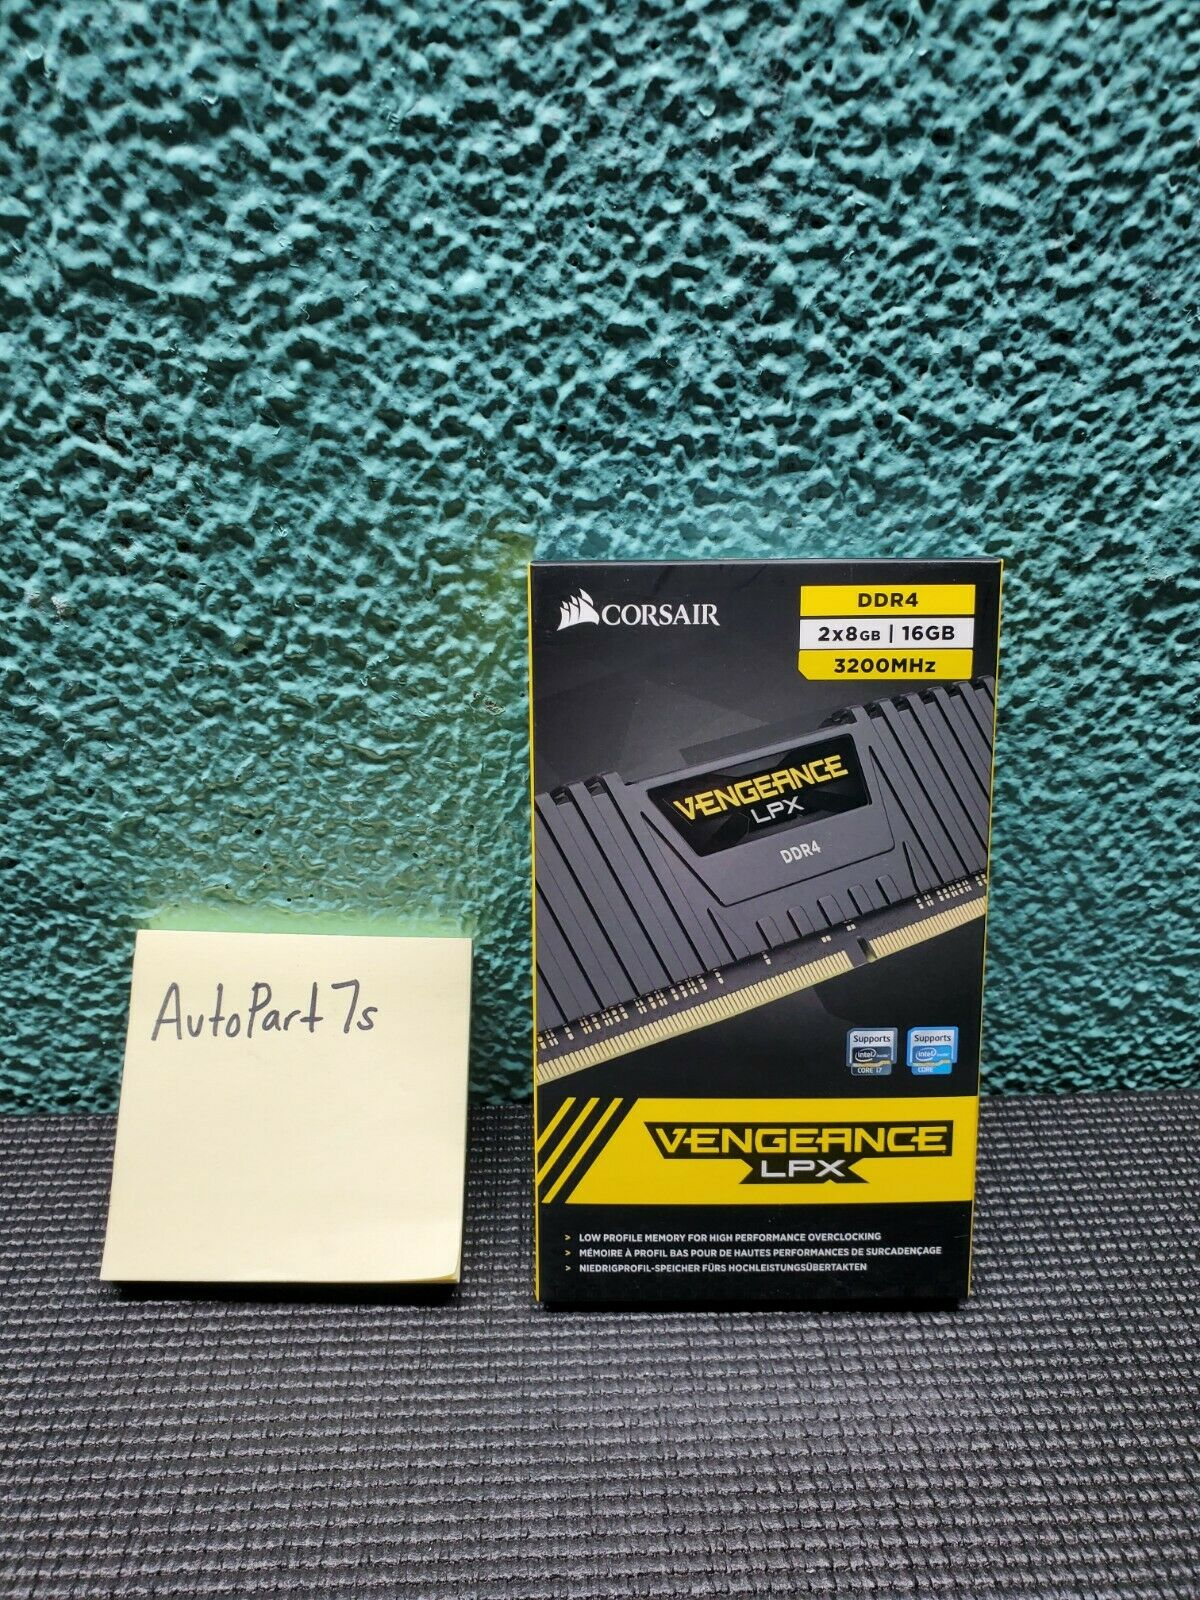 Corsair Vengeance LPX 16GB (2x8GB) DDR4 3200MHz C16 Desktop Memory Kit ✅. Buy it now for 79.97